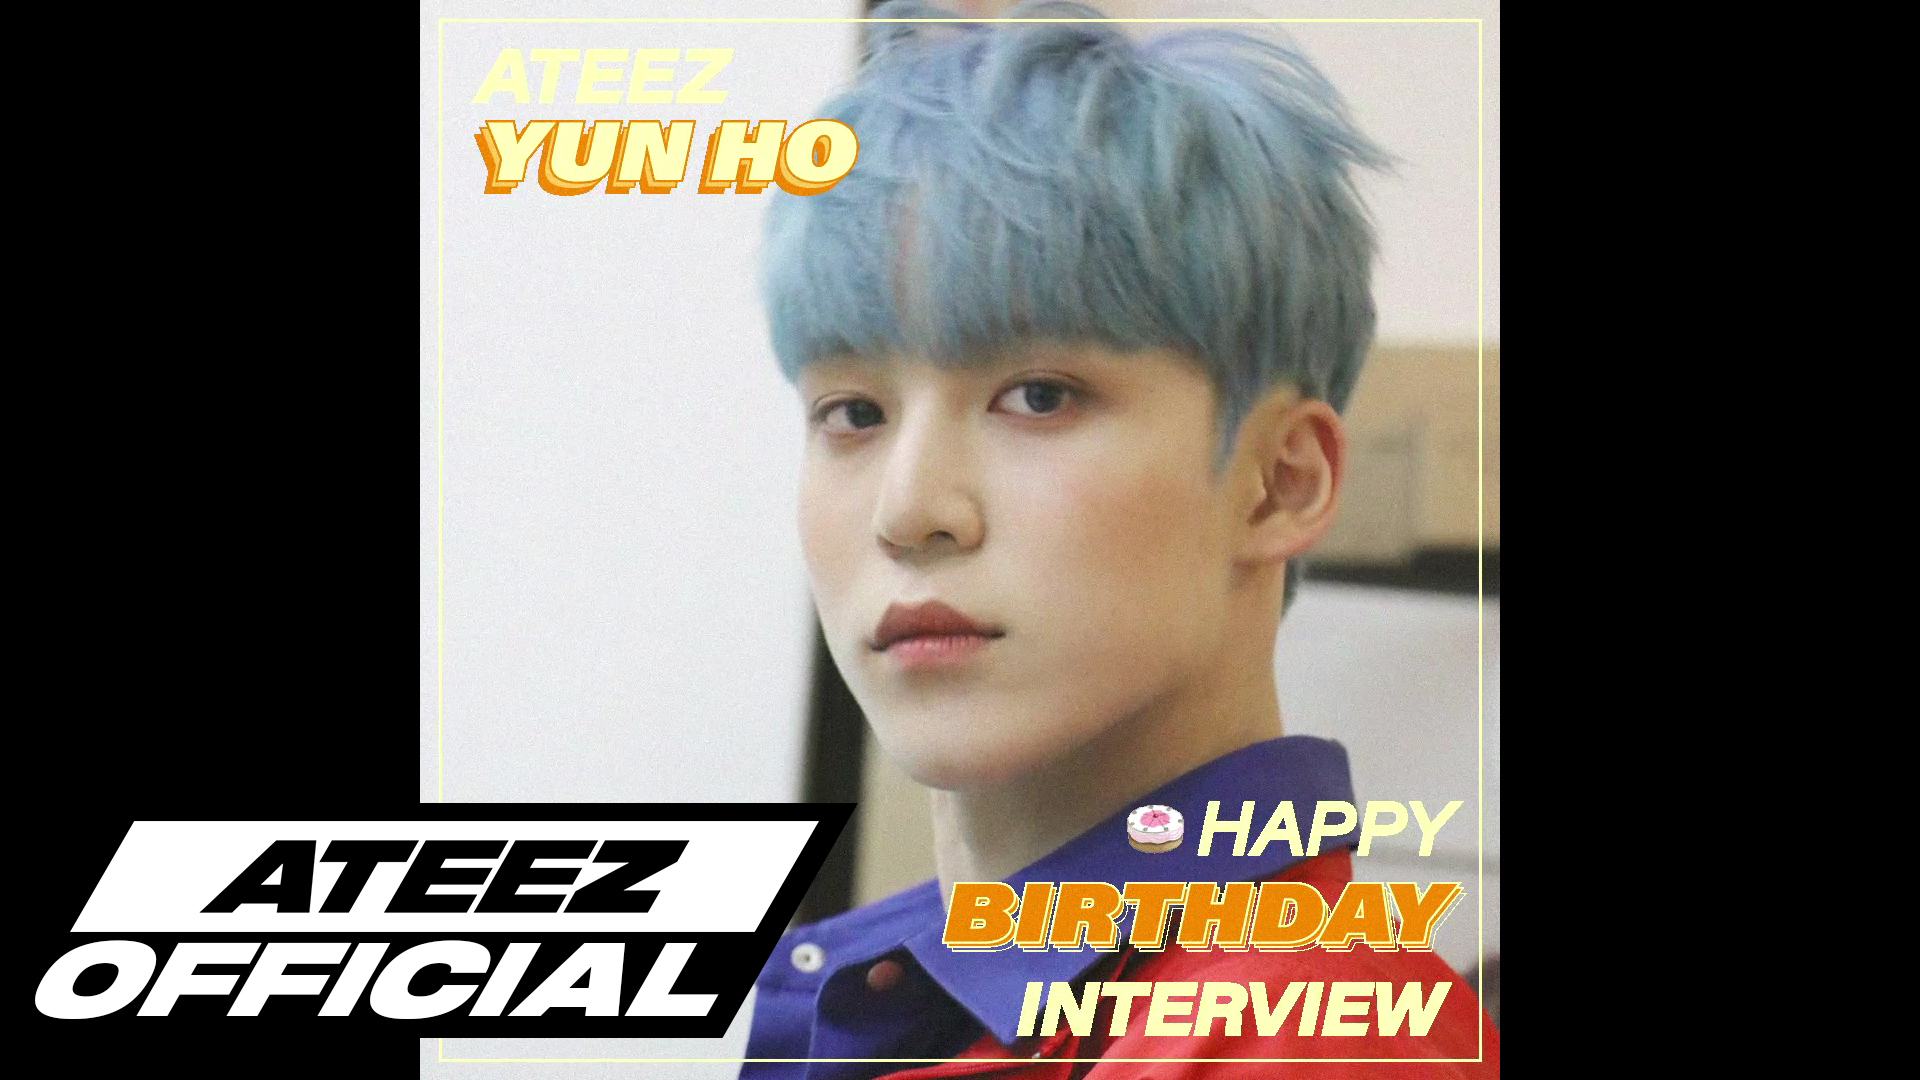 ATEEZ(에이티즈) 윤호 생일 8문 8답 INTERVIEW